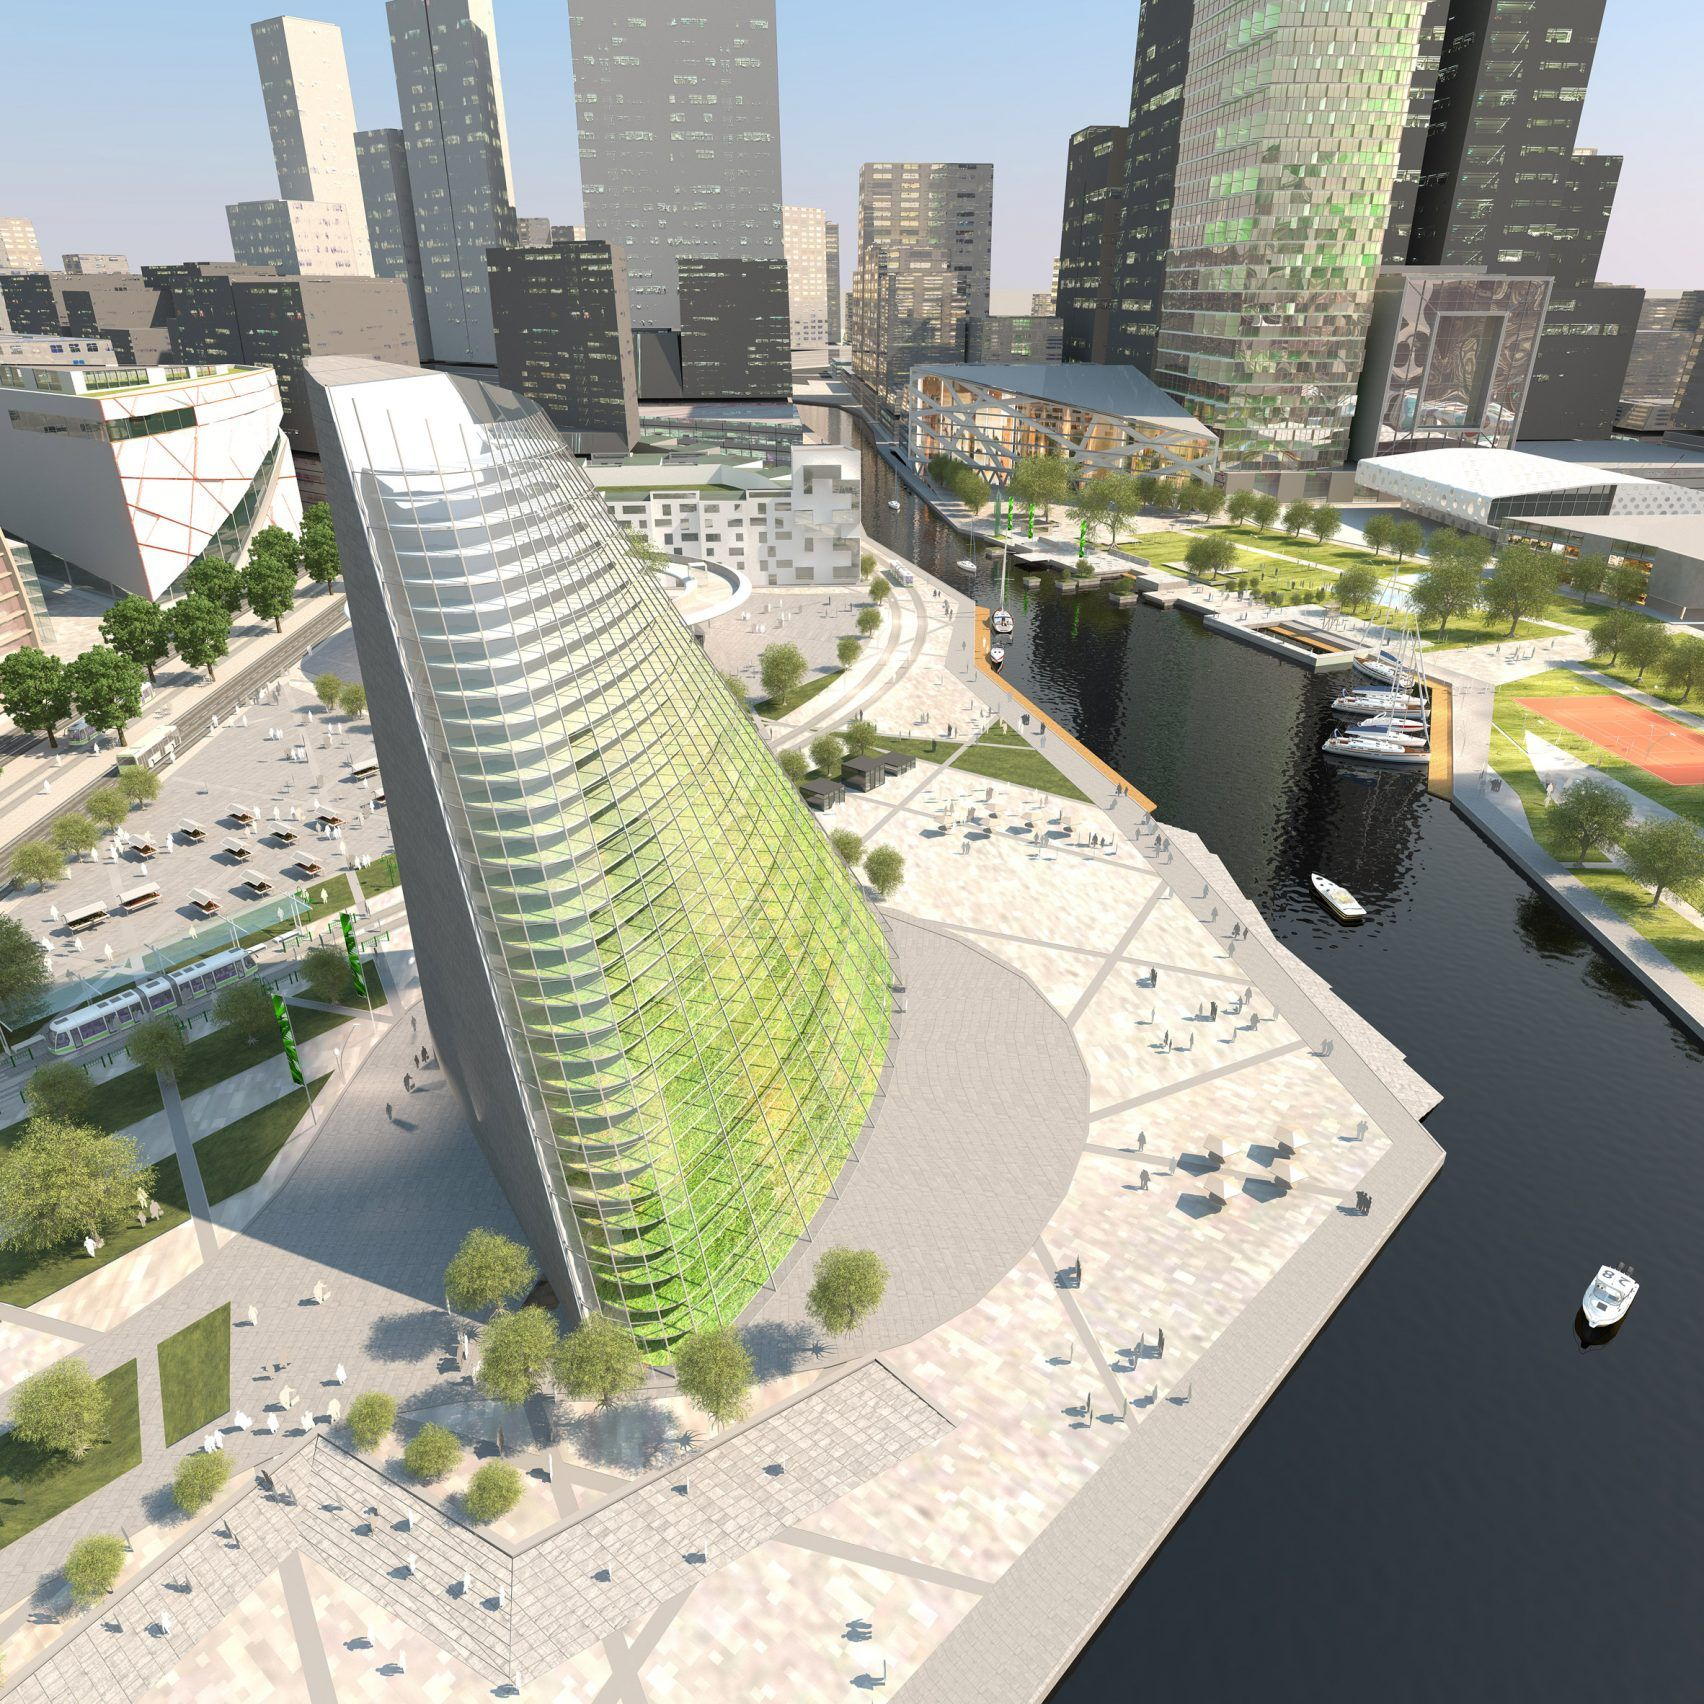 Plantagon Designs An Office Block Containing A 60-metre